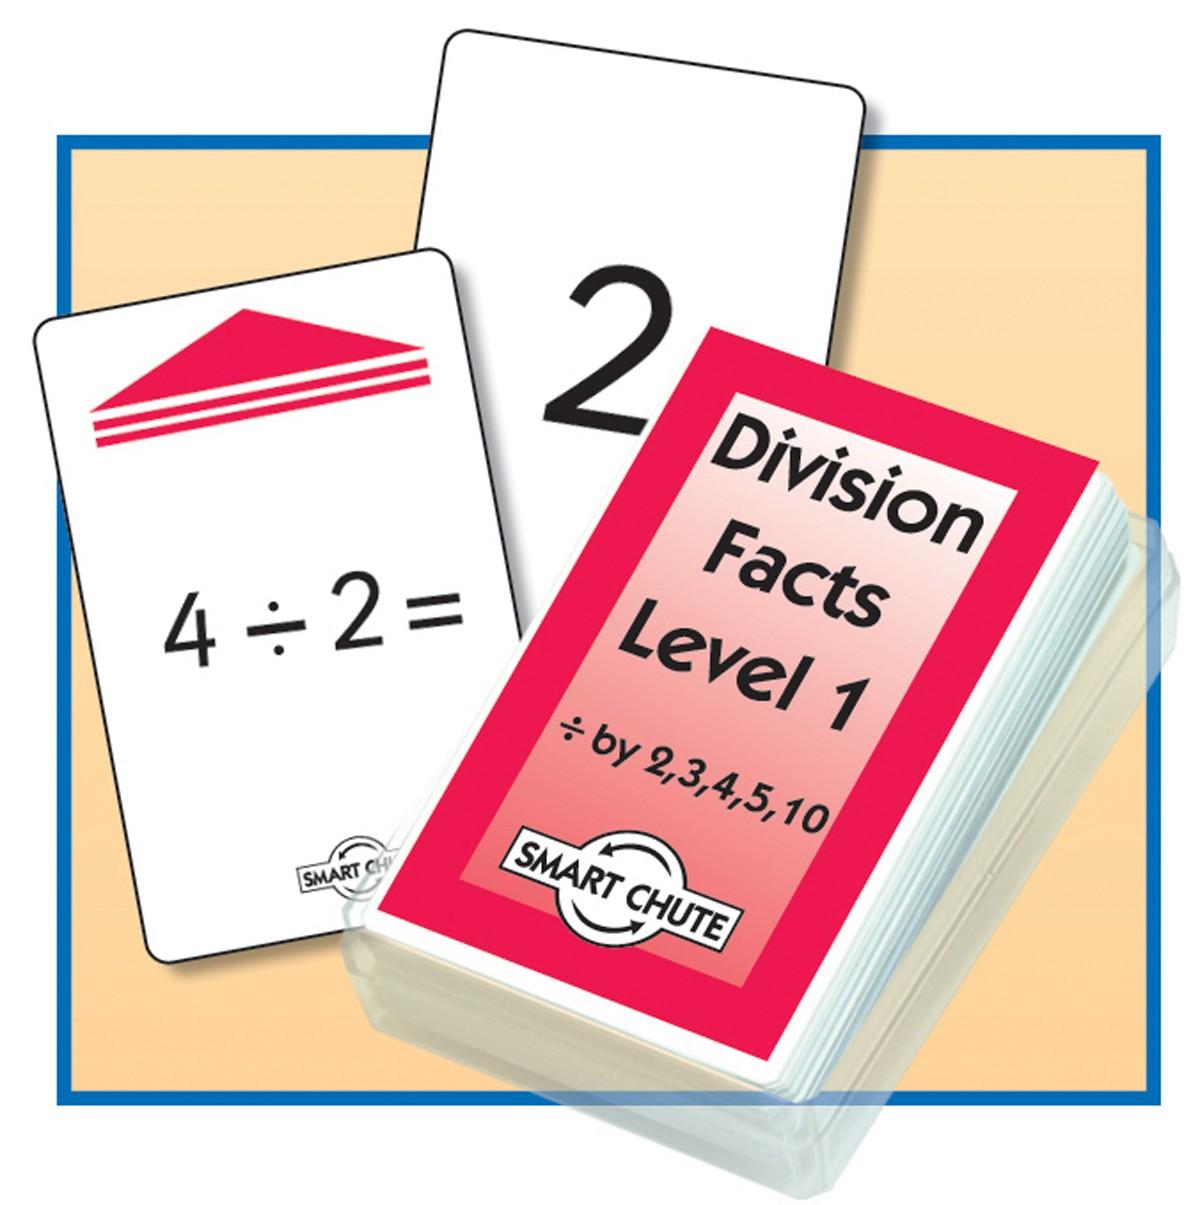 Smart Chute Division nivå 1